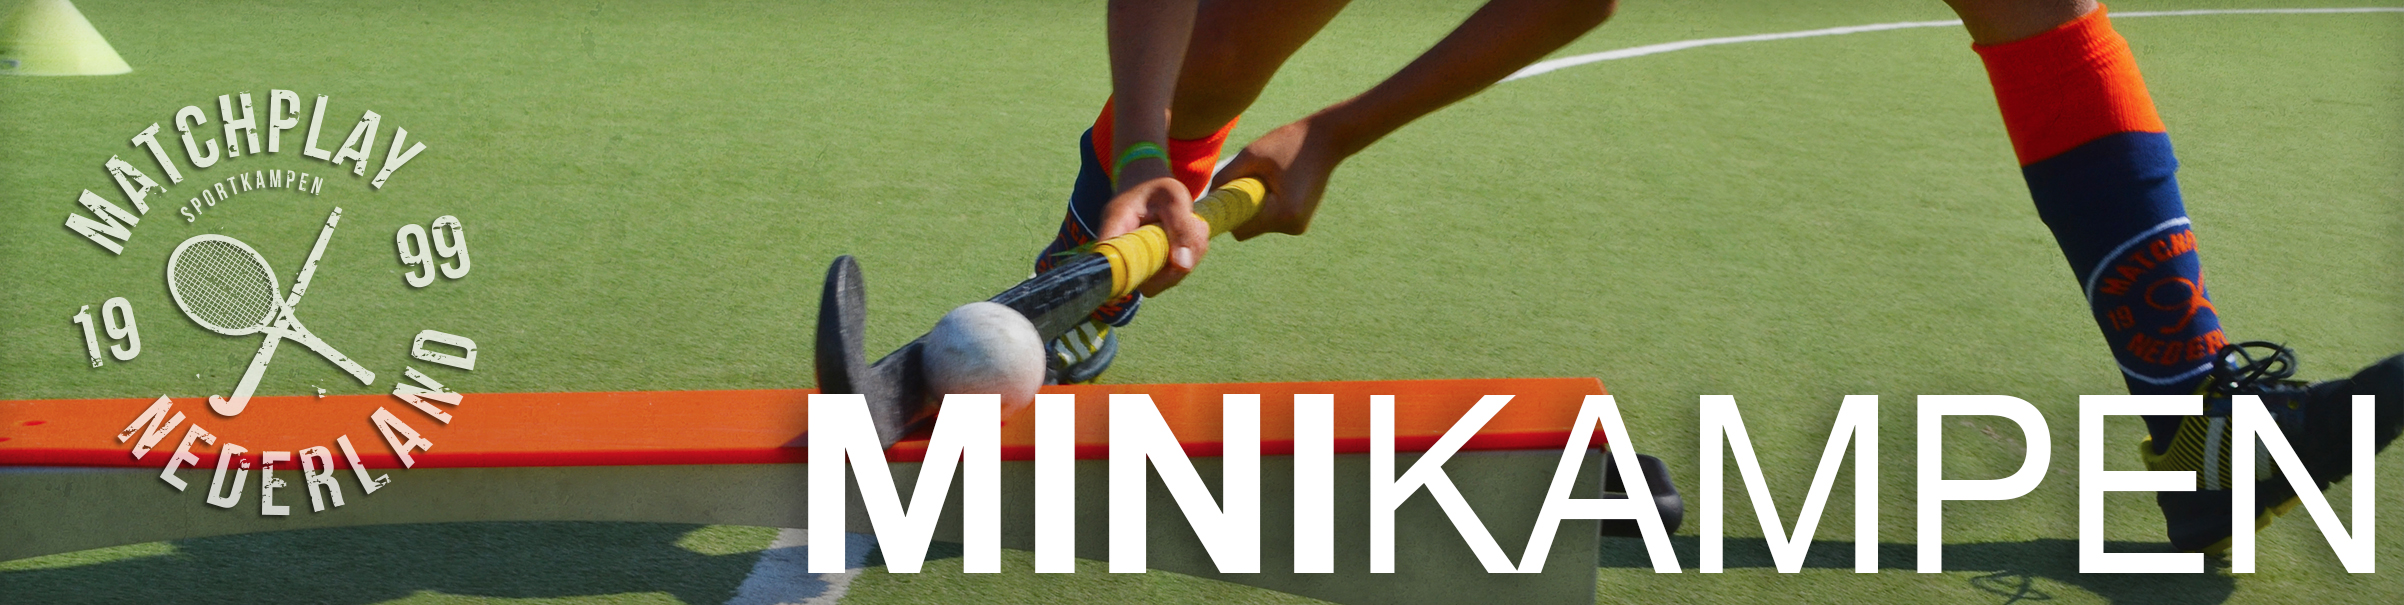 Site-banner-Hockey-Minikampen-2